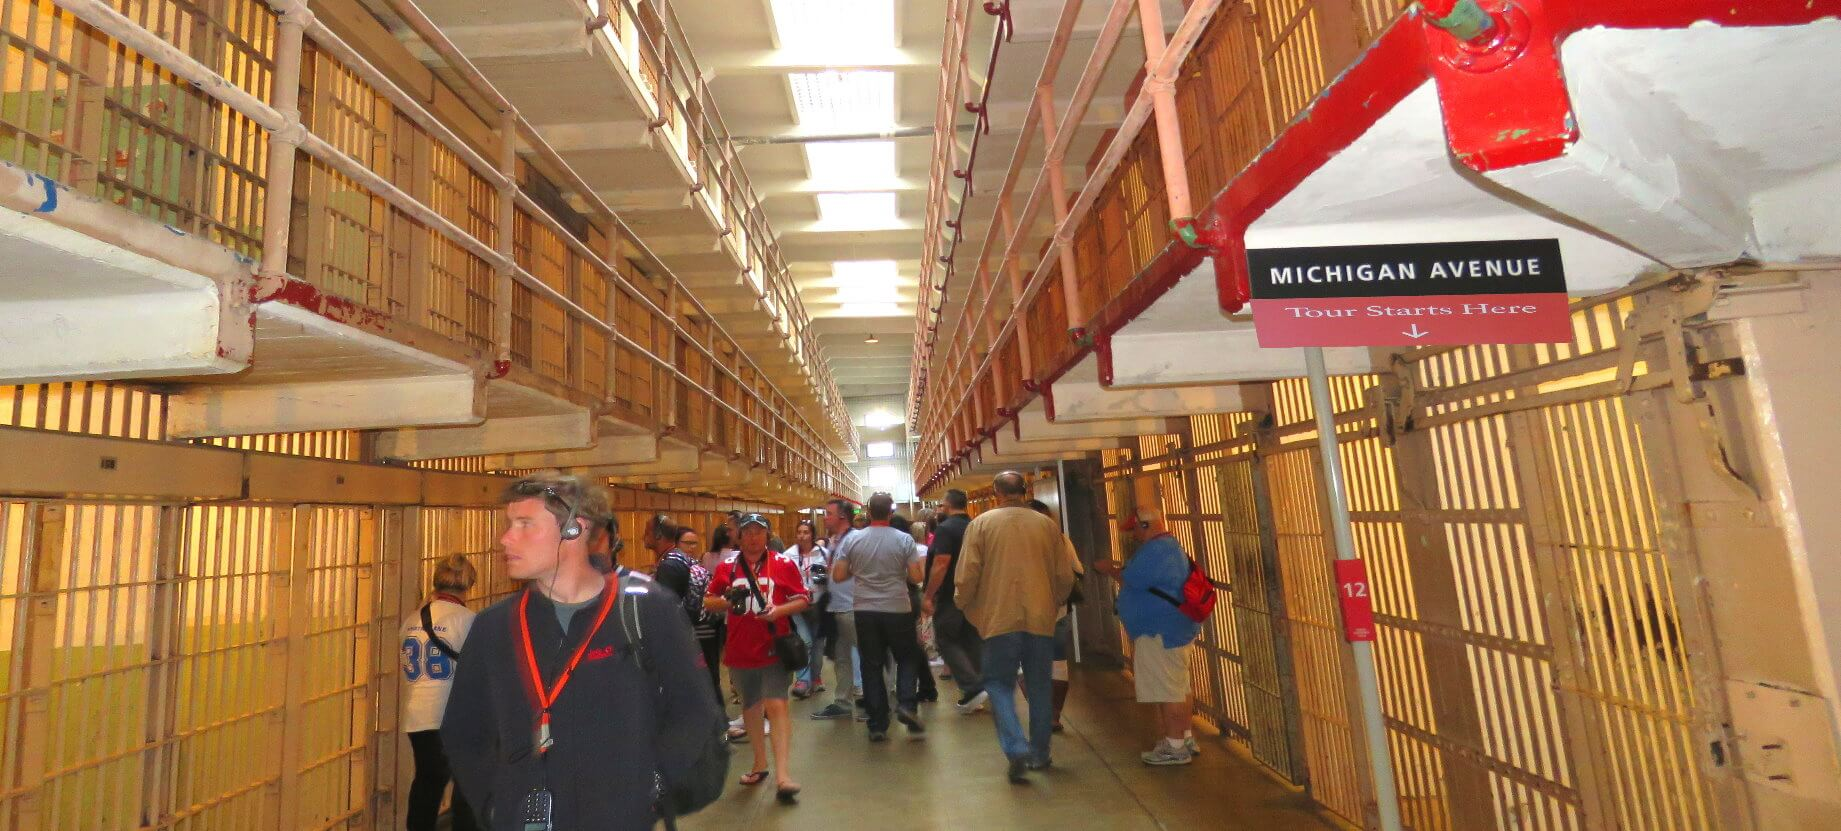 visit-alcatraz_island-audio-tour-alcatraz-prison-cells